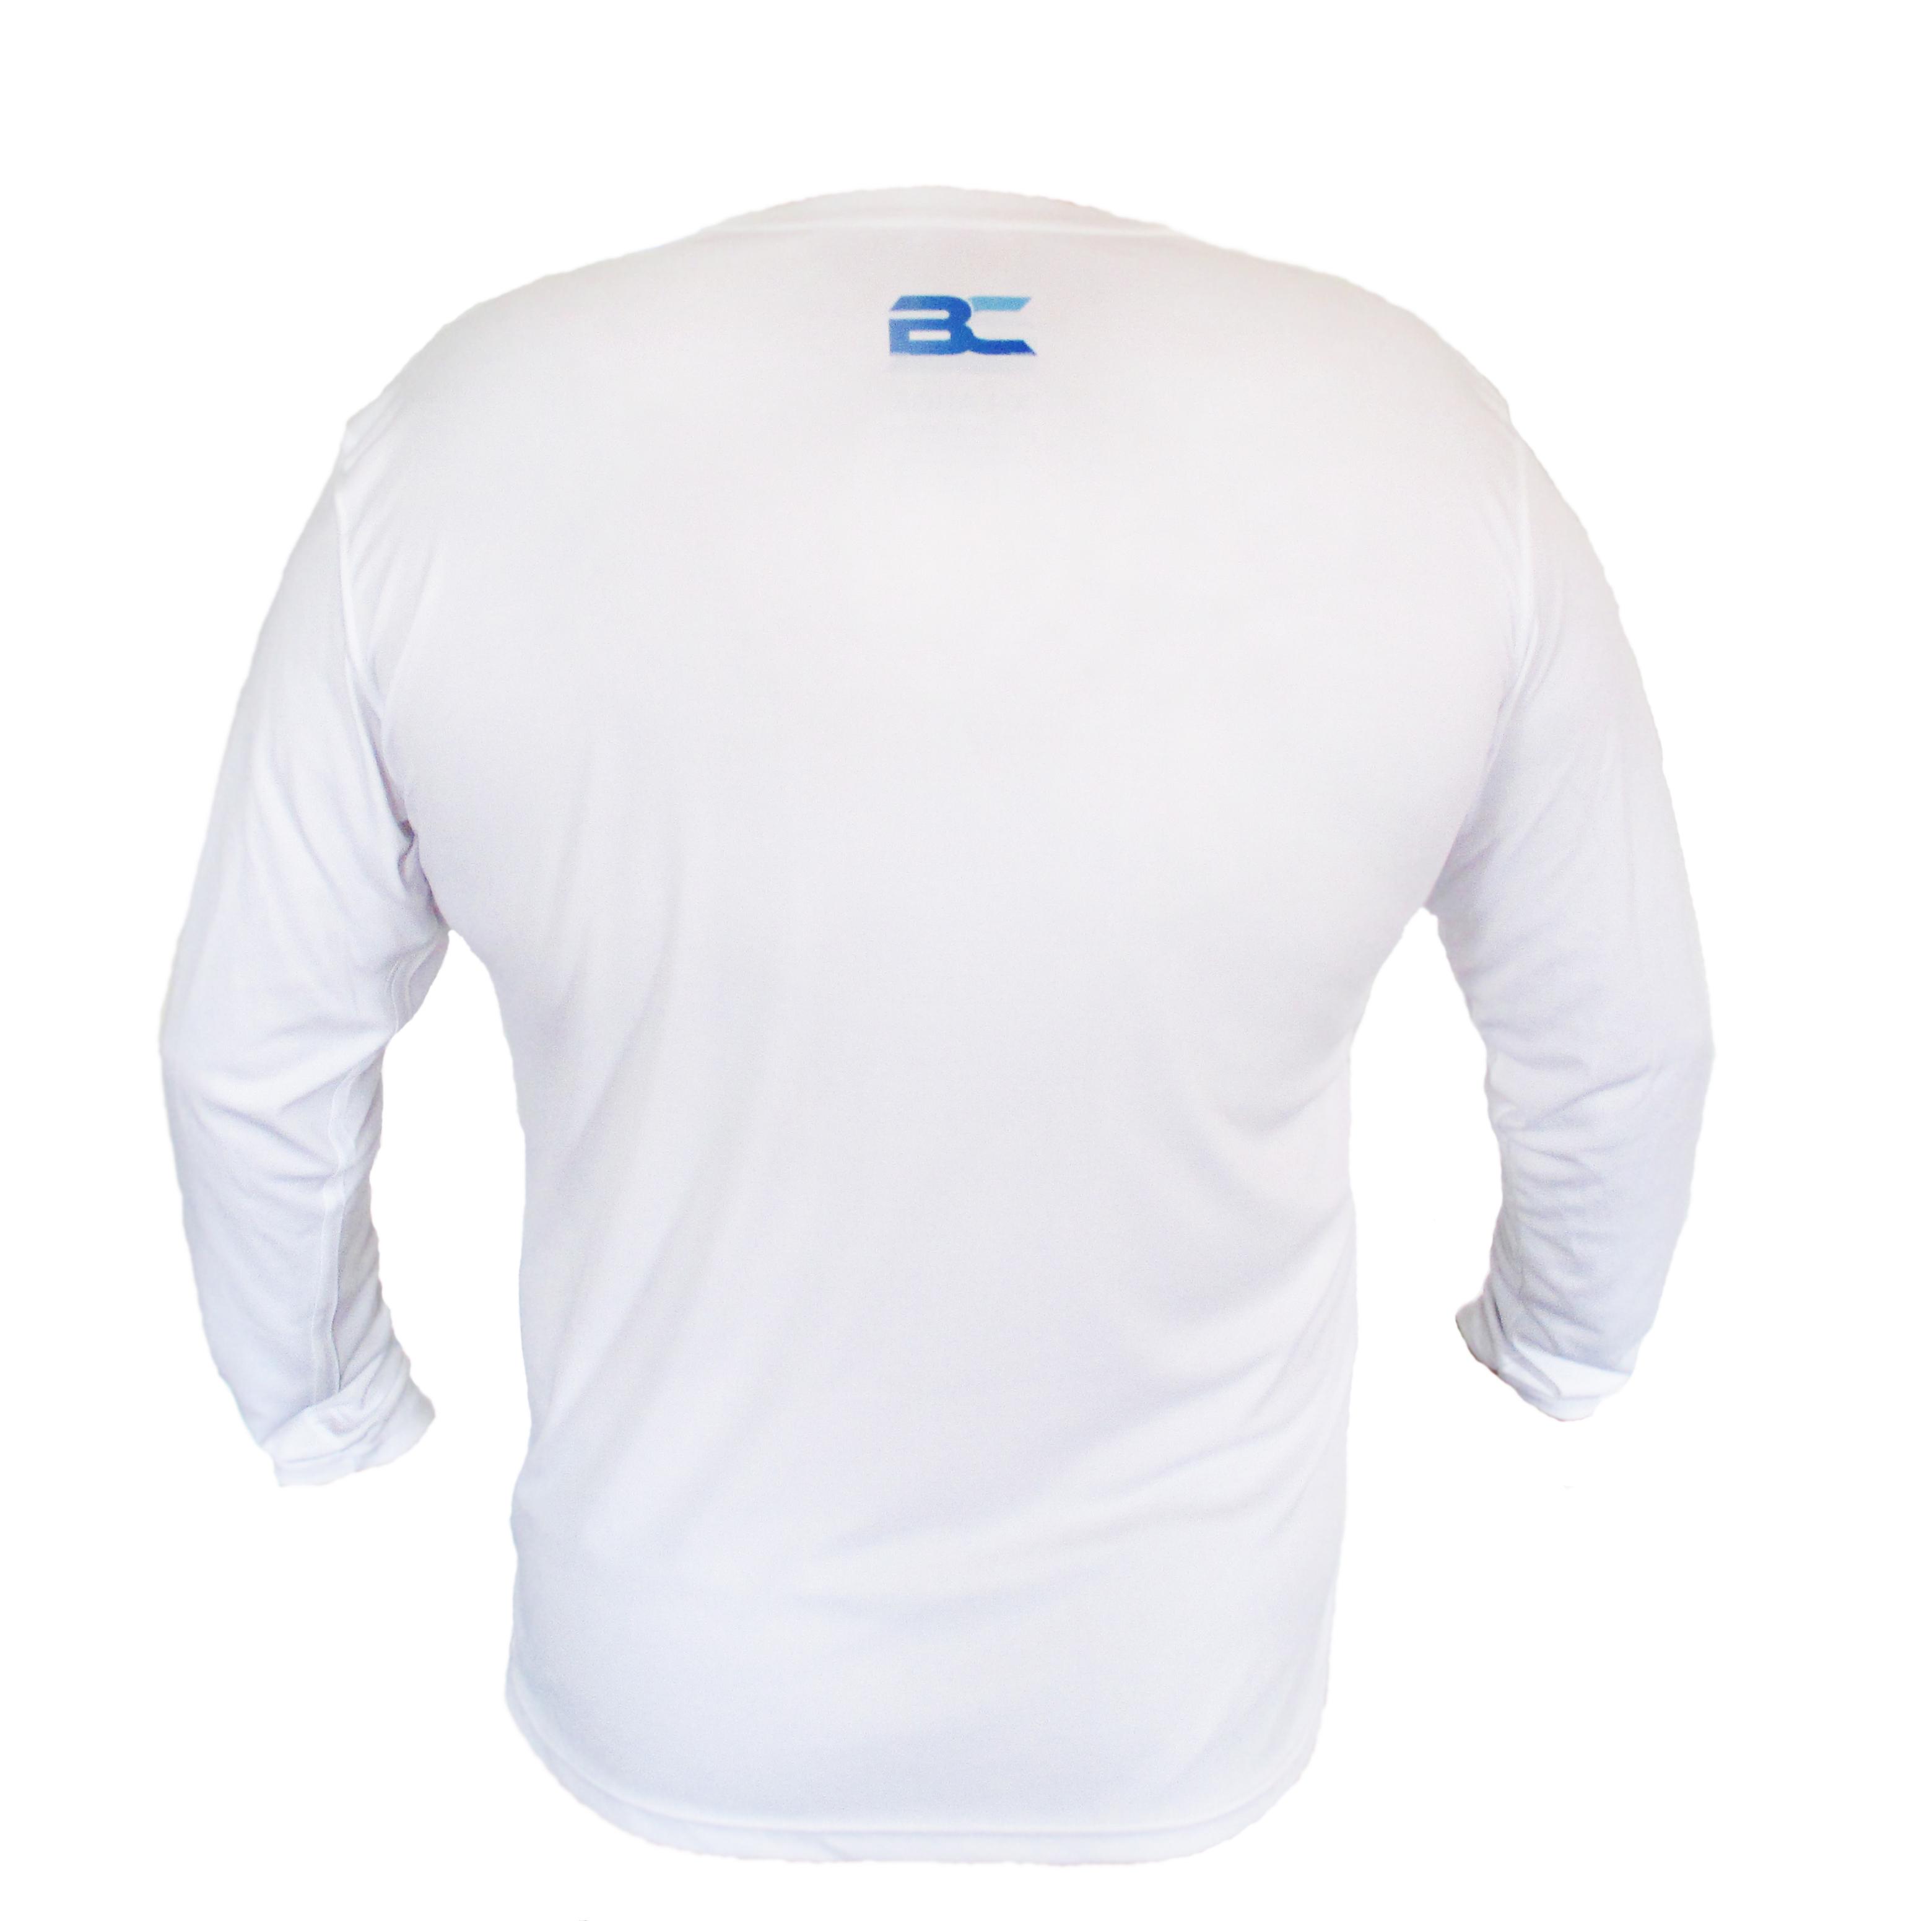 BC back of performance long sleeve fishing shirt